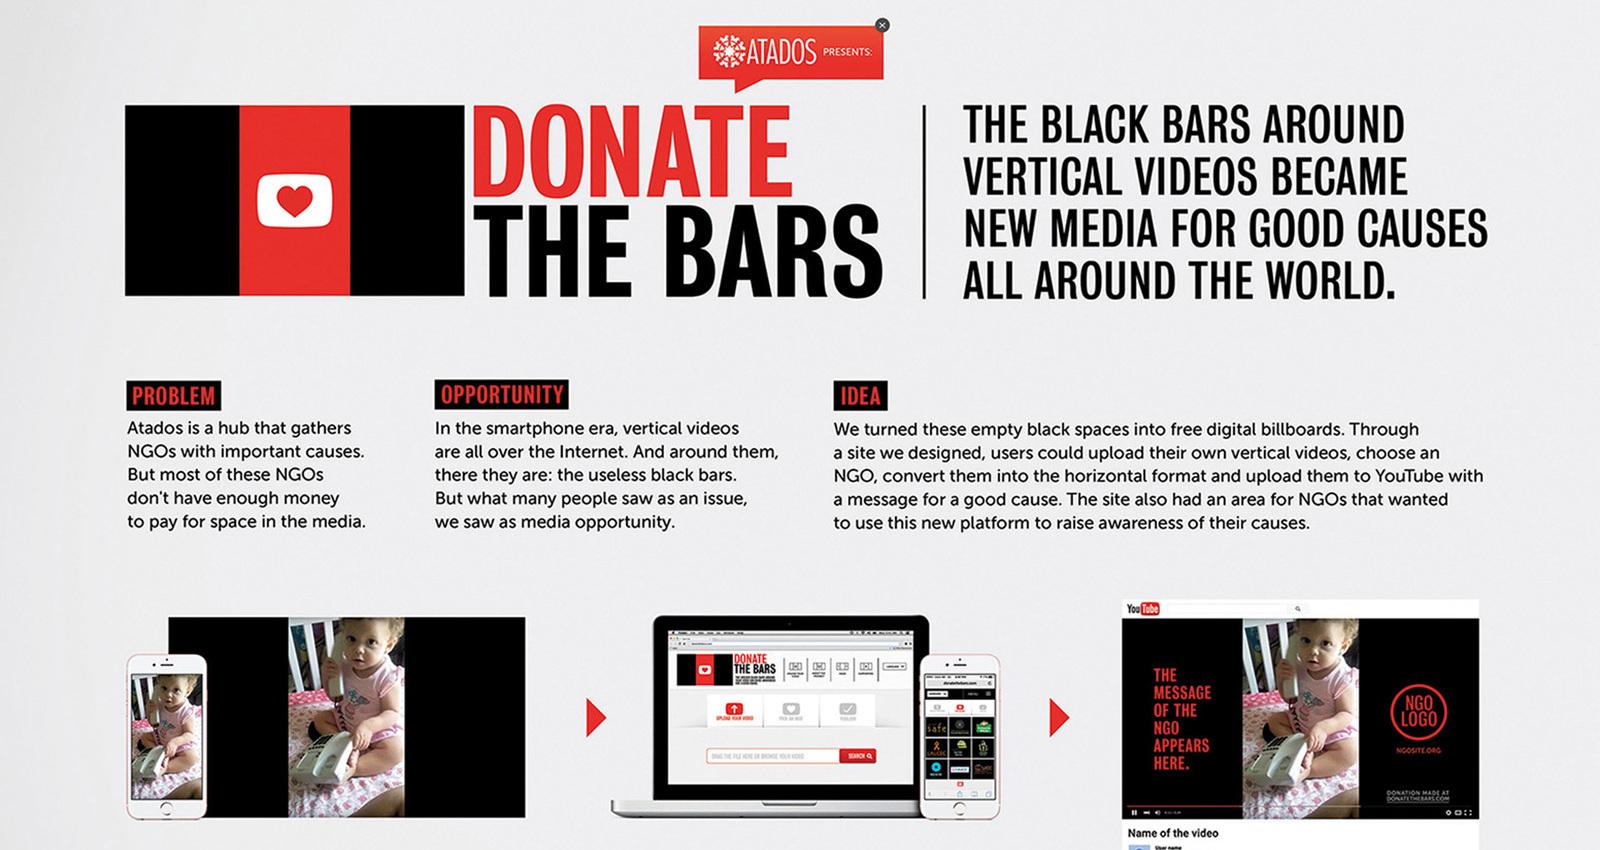 Donate the Bars